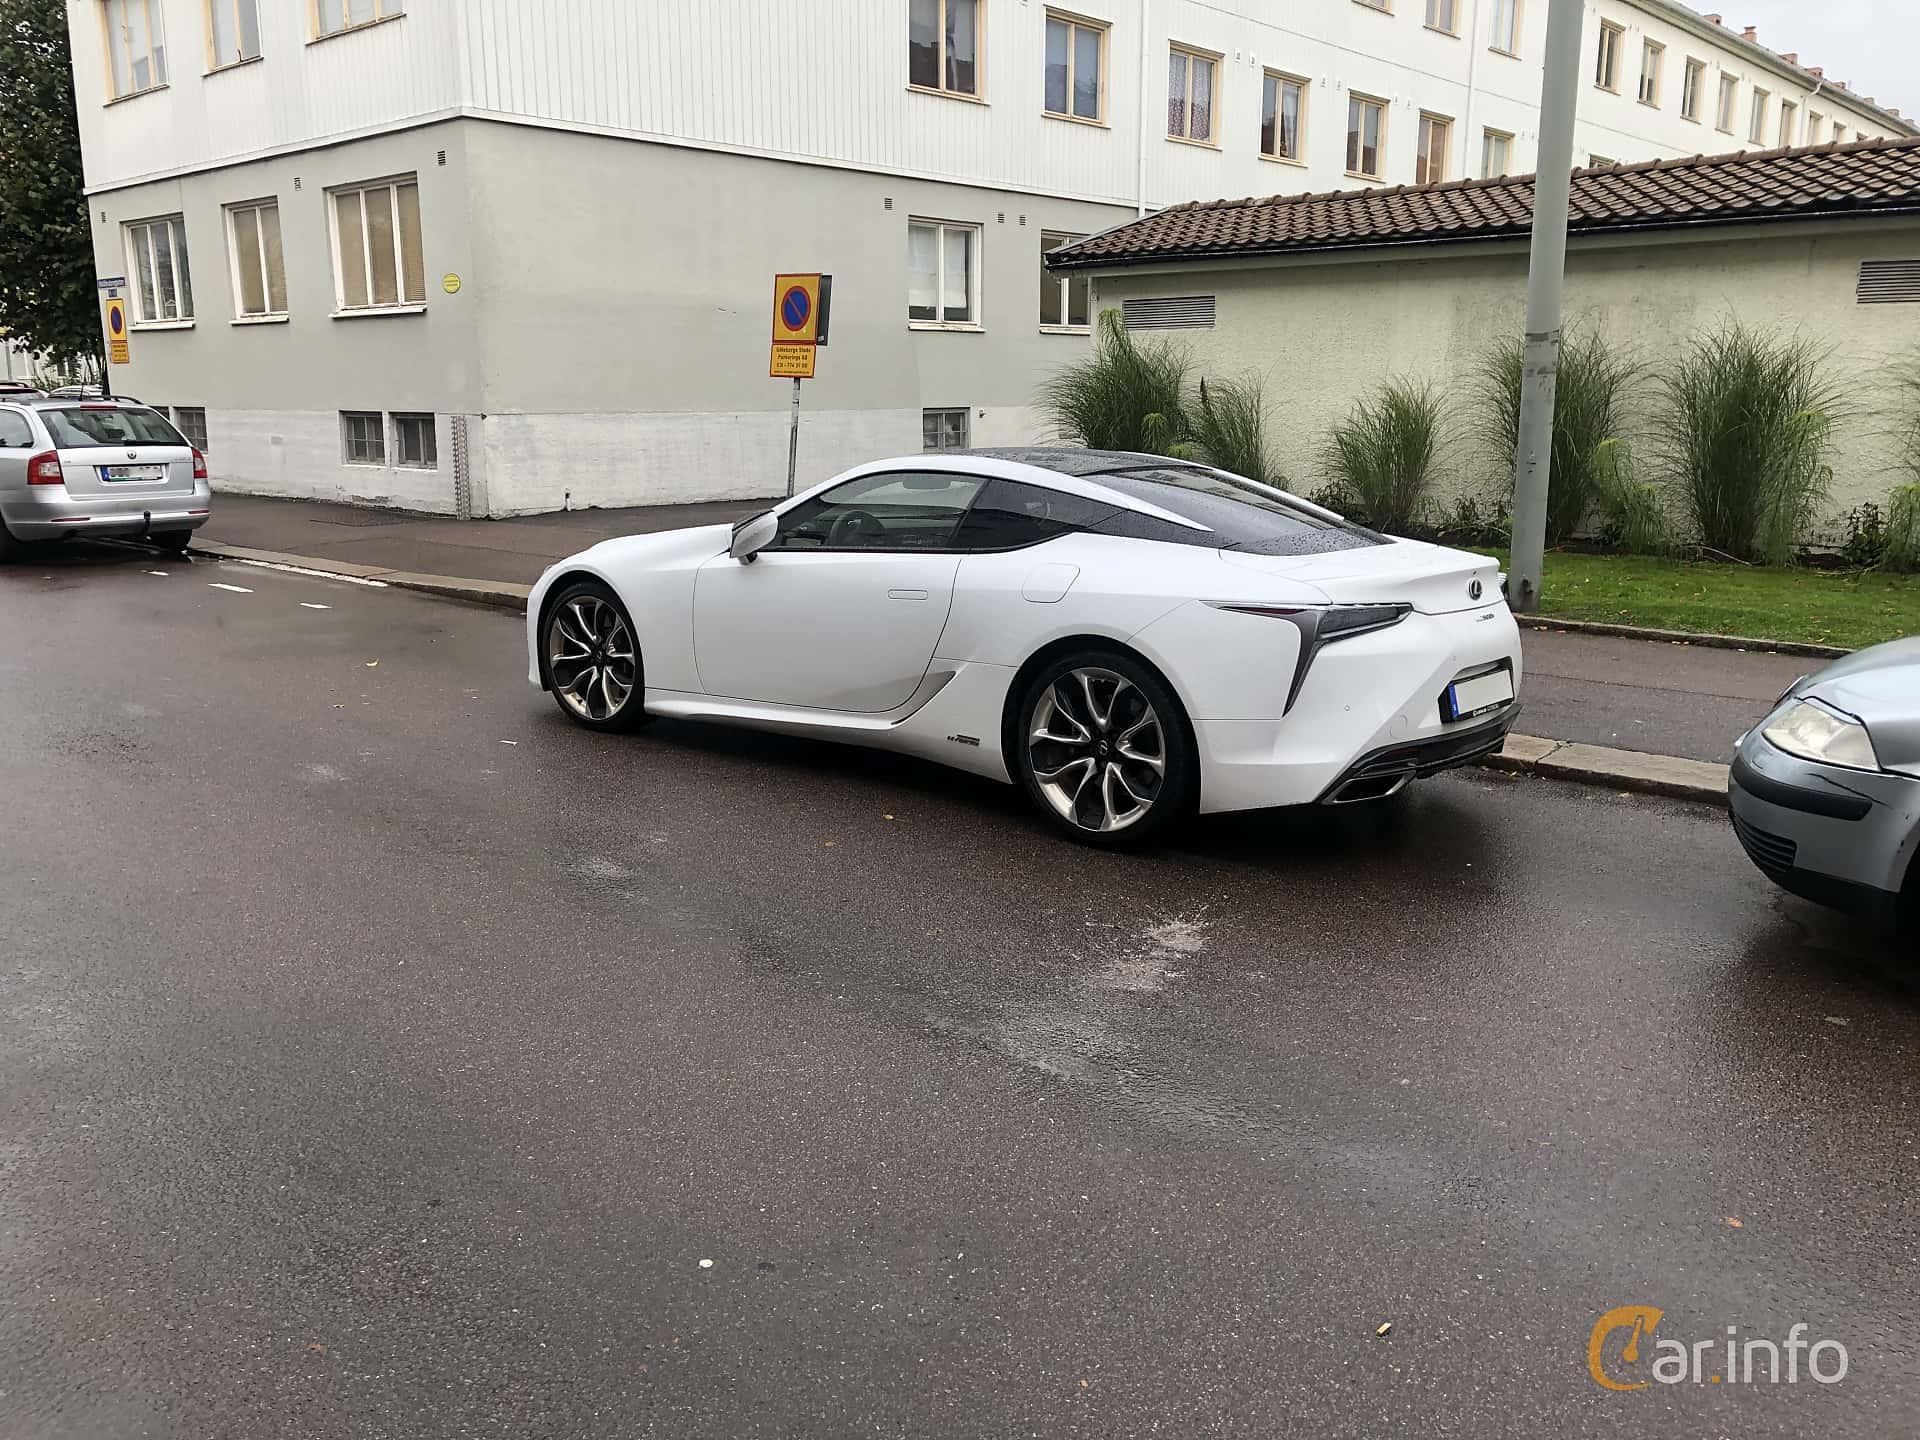 Lexus LC 500h 3.5 V6 Automatisk, 354hk, 2019